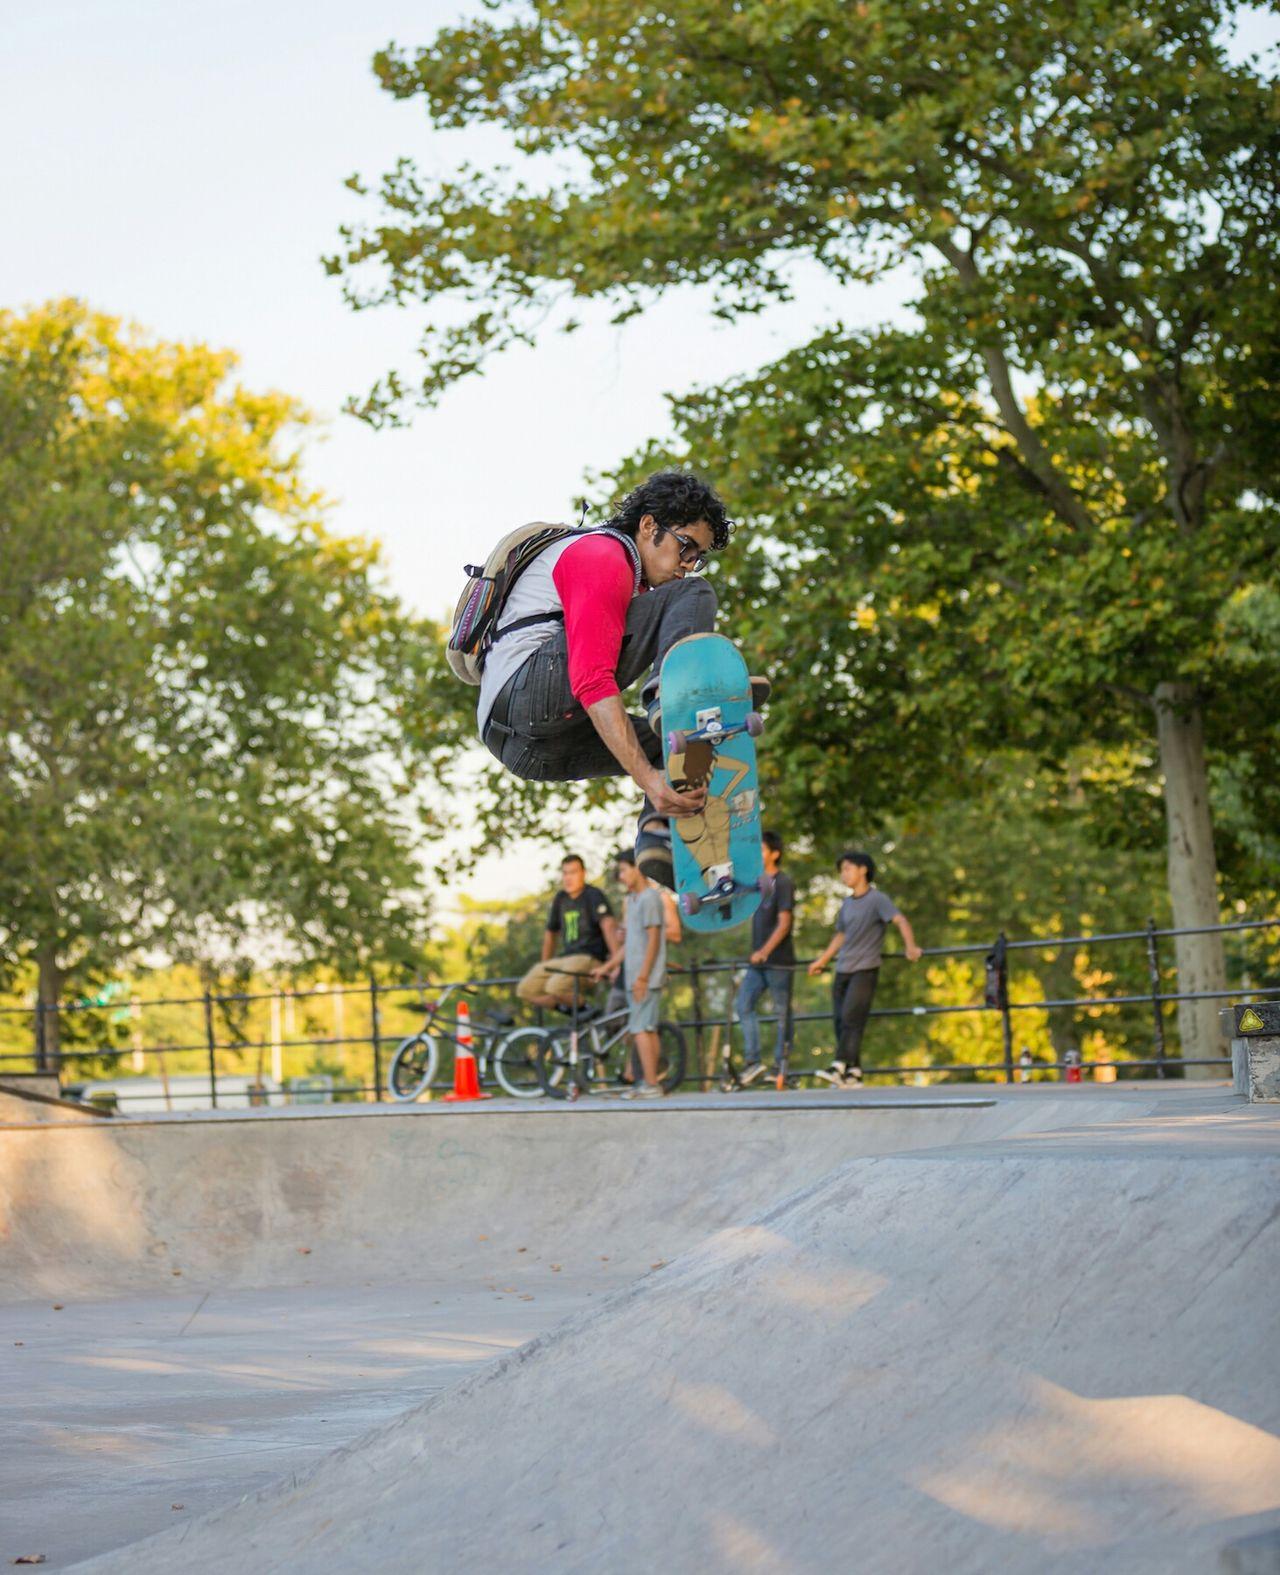 Sport In The City Skatepark New York City I Love My City Skateboarding David Gutierrez Pixelperfectnyc EyeEm Best Shots Amazing Tricks Newyorkcity